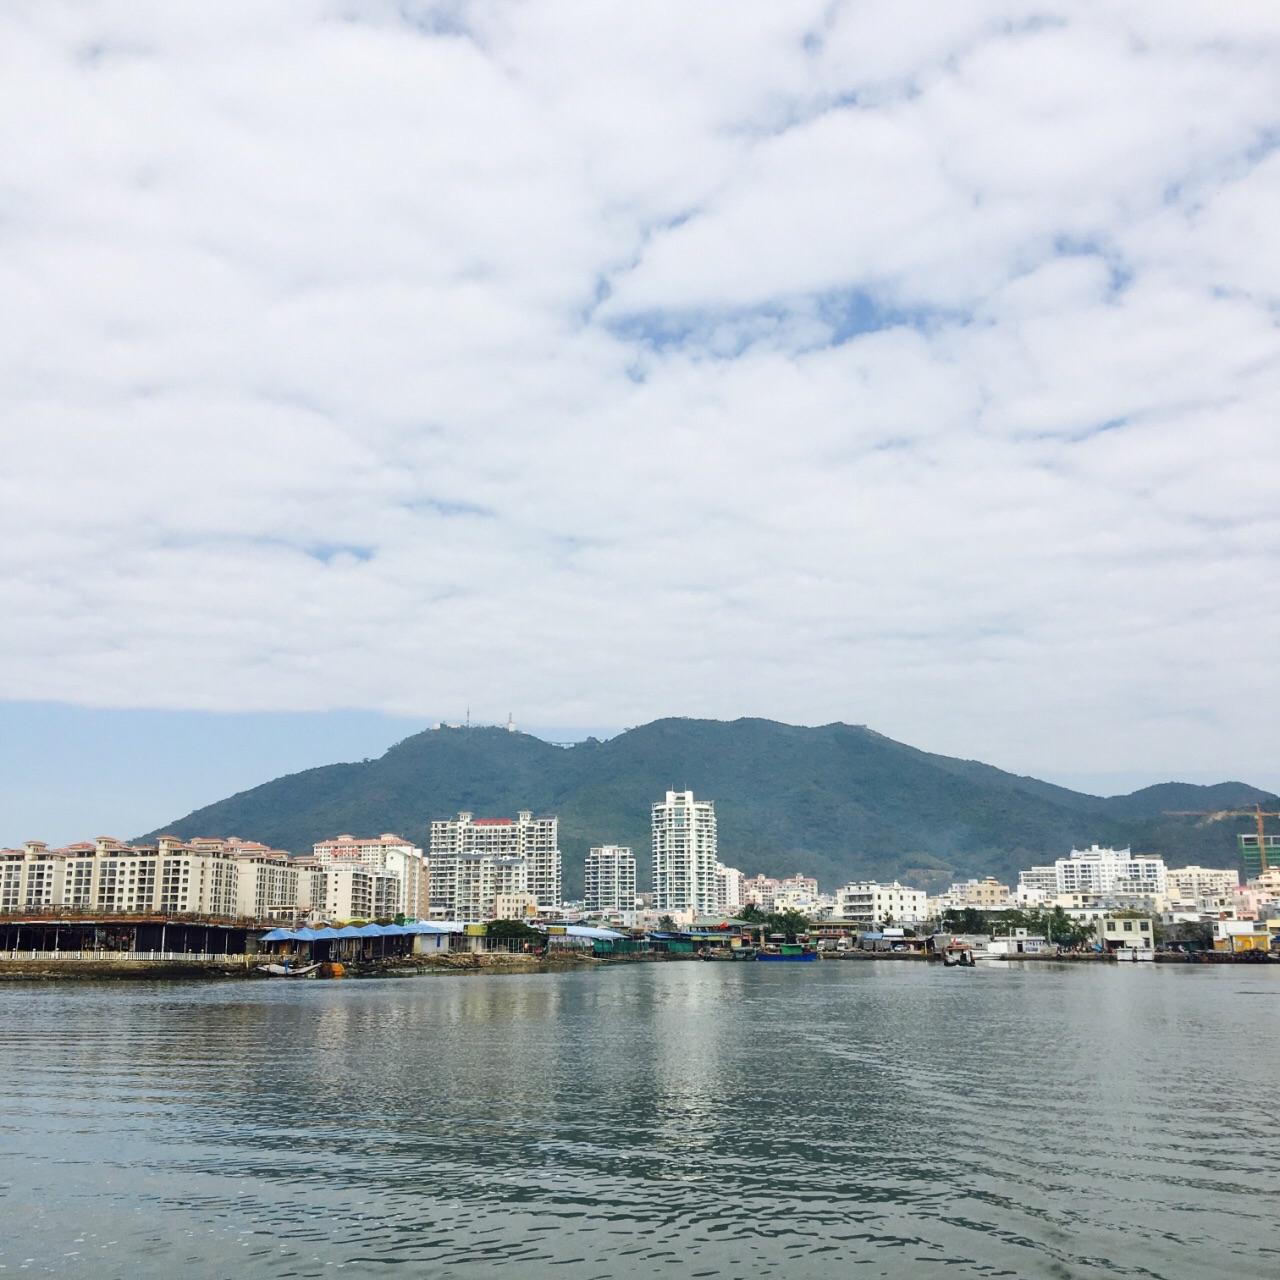 Yulin Harbor